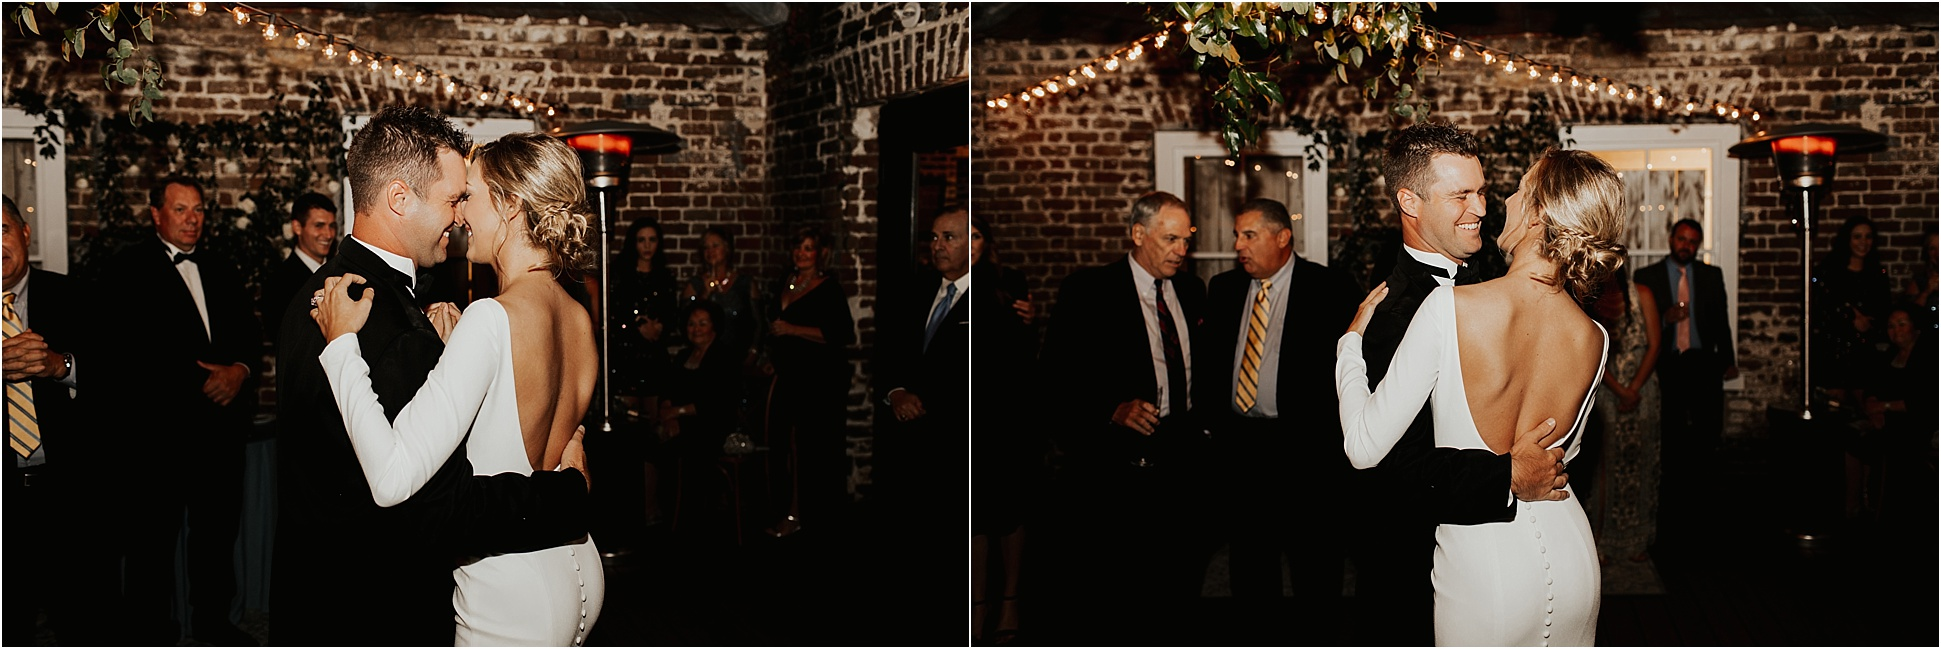 upstairs_midtown_intimate_charleston_wedding077.JPG